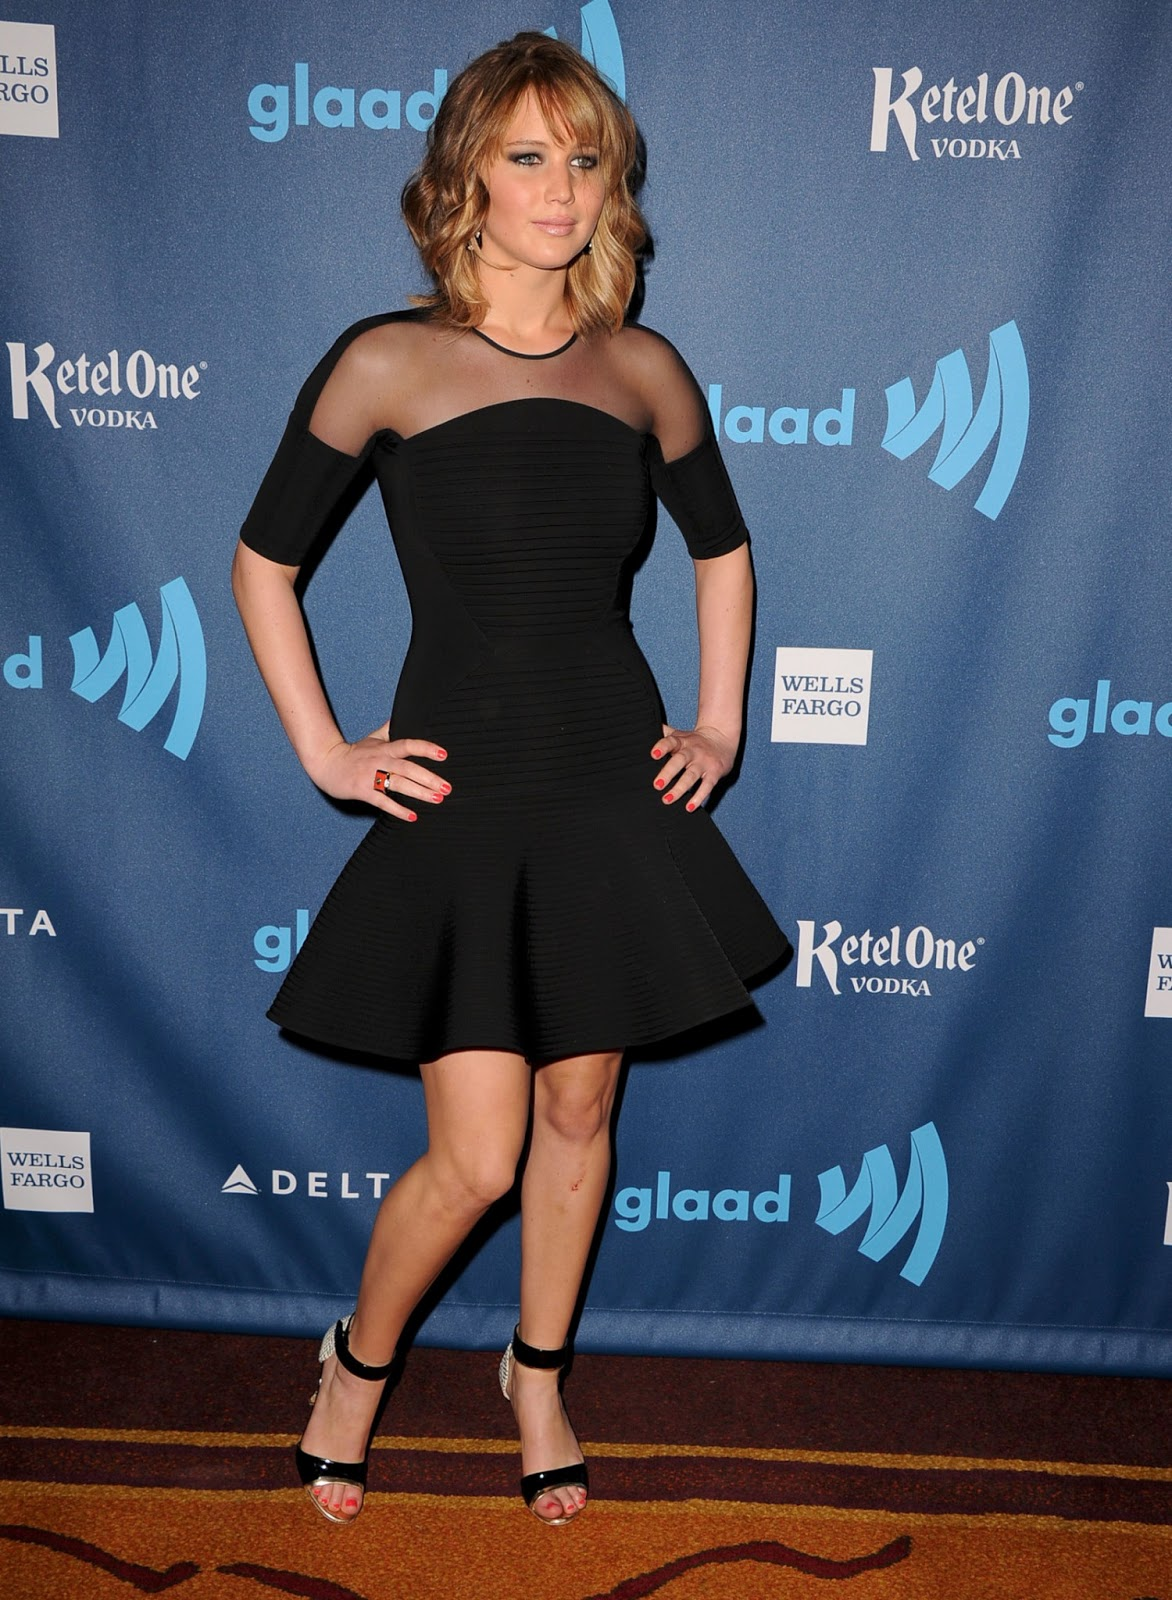 Jennifer Lawrence 24th Annual Glaad Media Awards